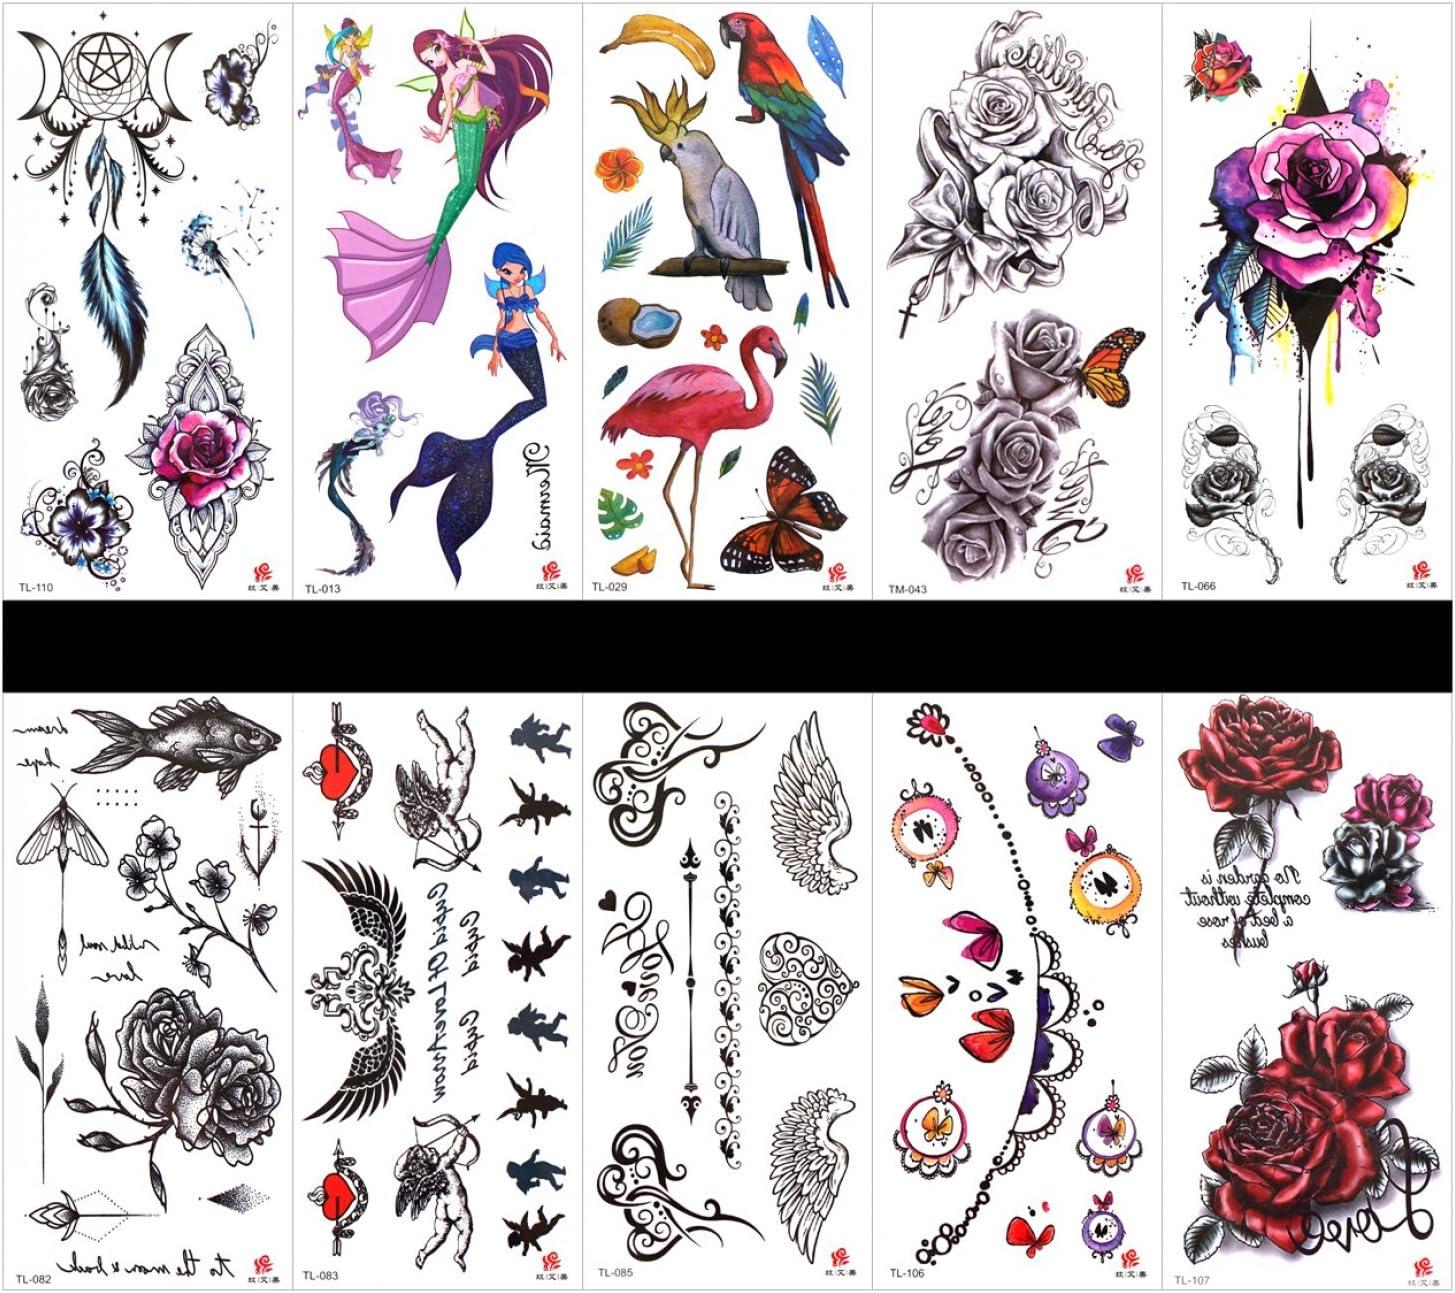 10 tatuajes de tatuaje de flores de tatuaje, impermeables y no ...